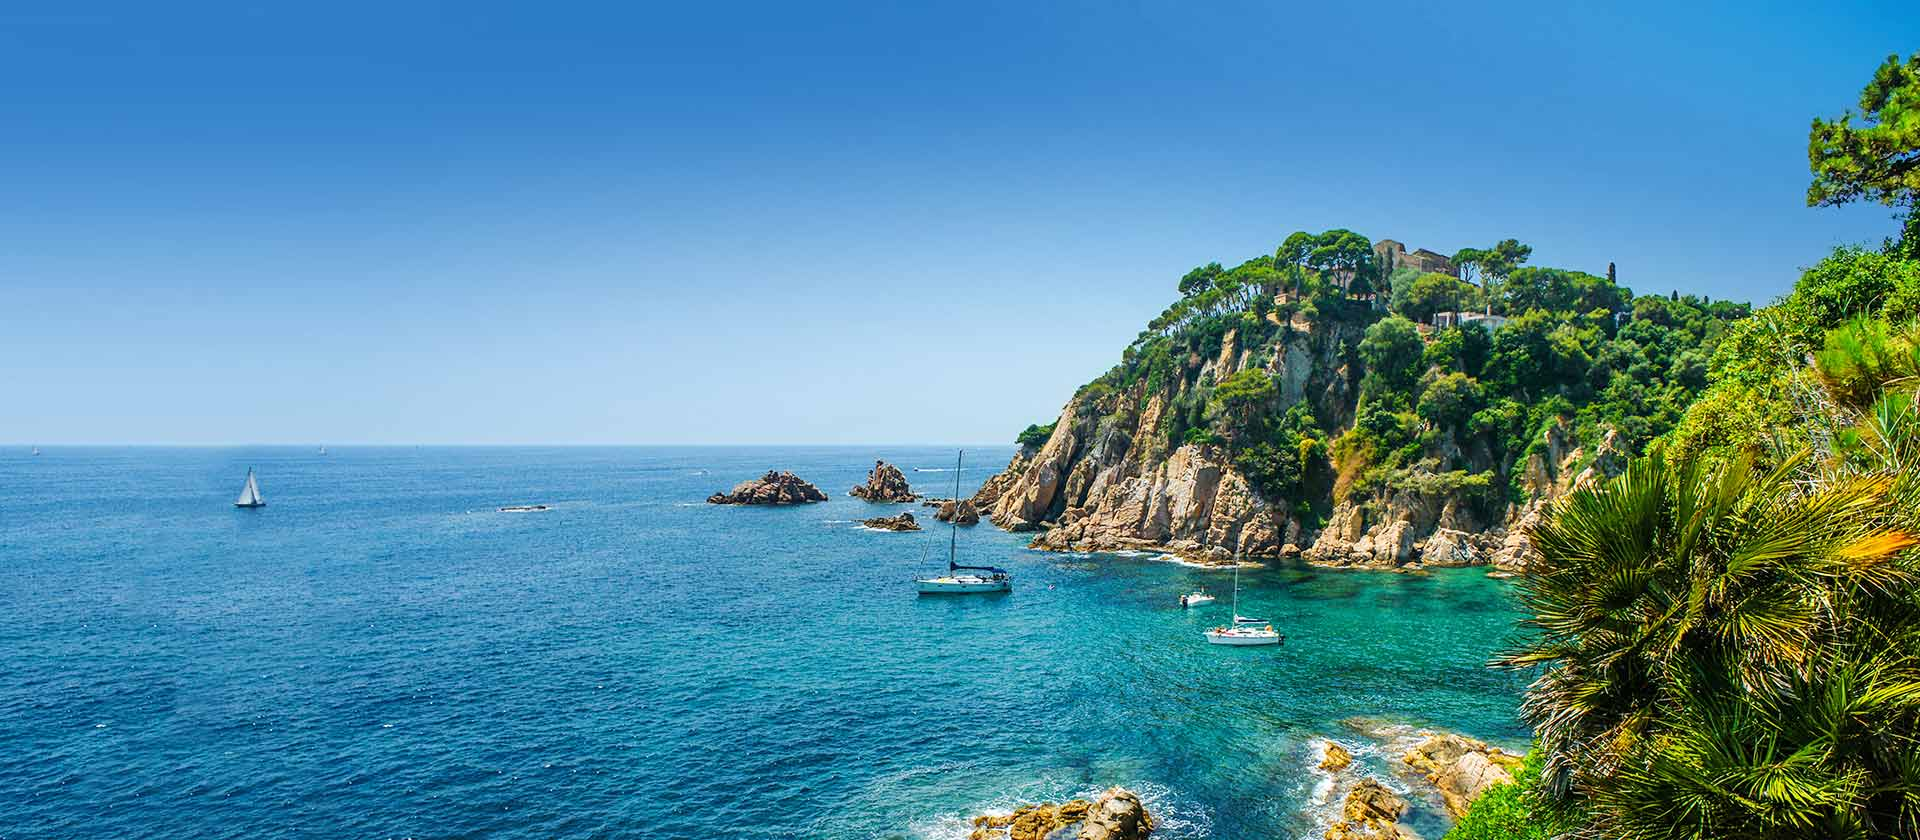 slider Destination Espagne : jusqu'à 2 nuits offertes